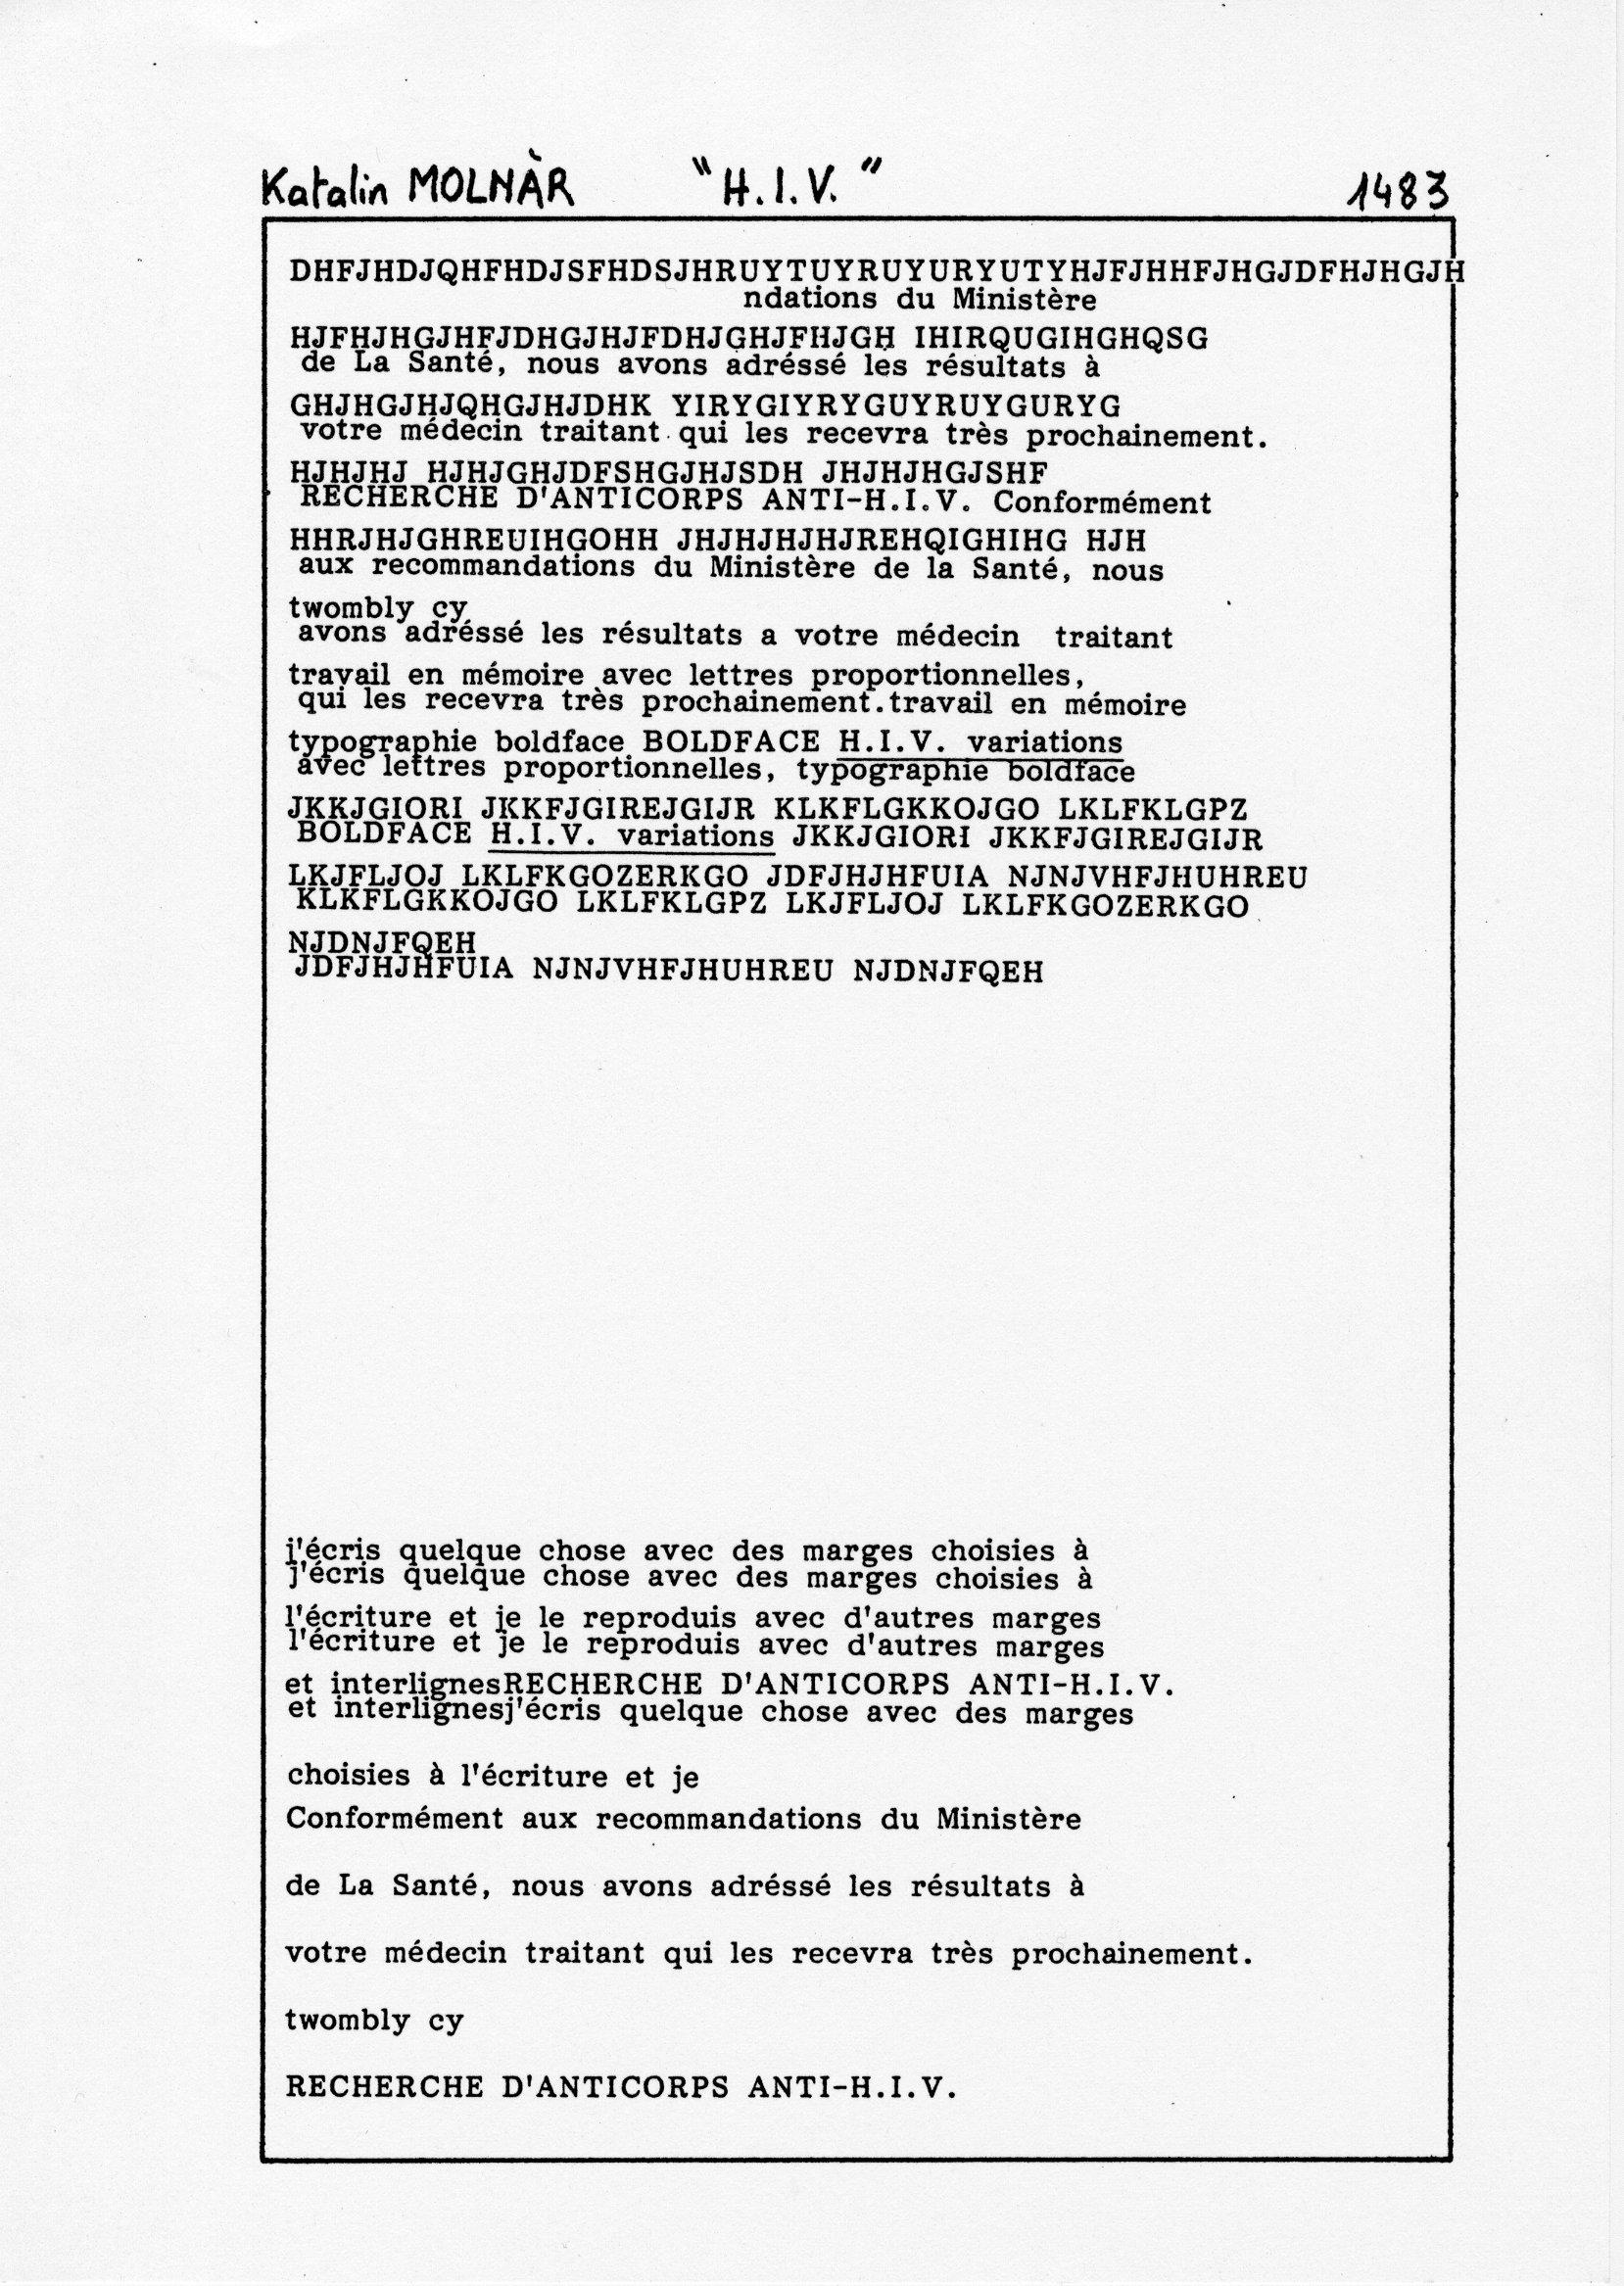 page 1483 K. Molnar H.I.V.